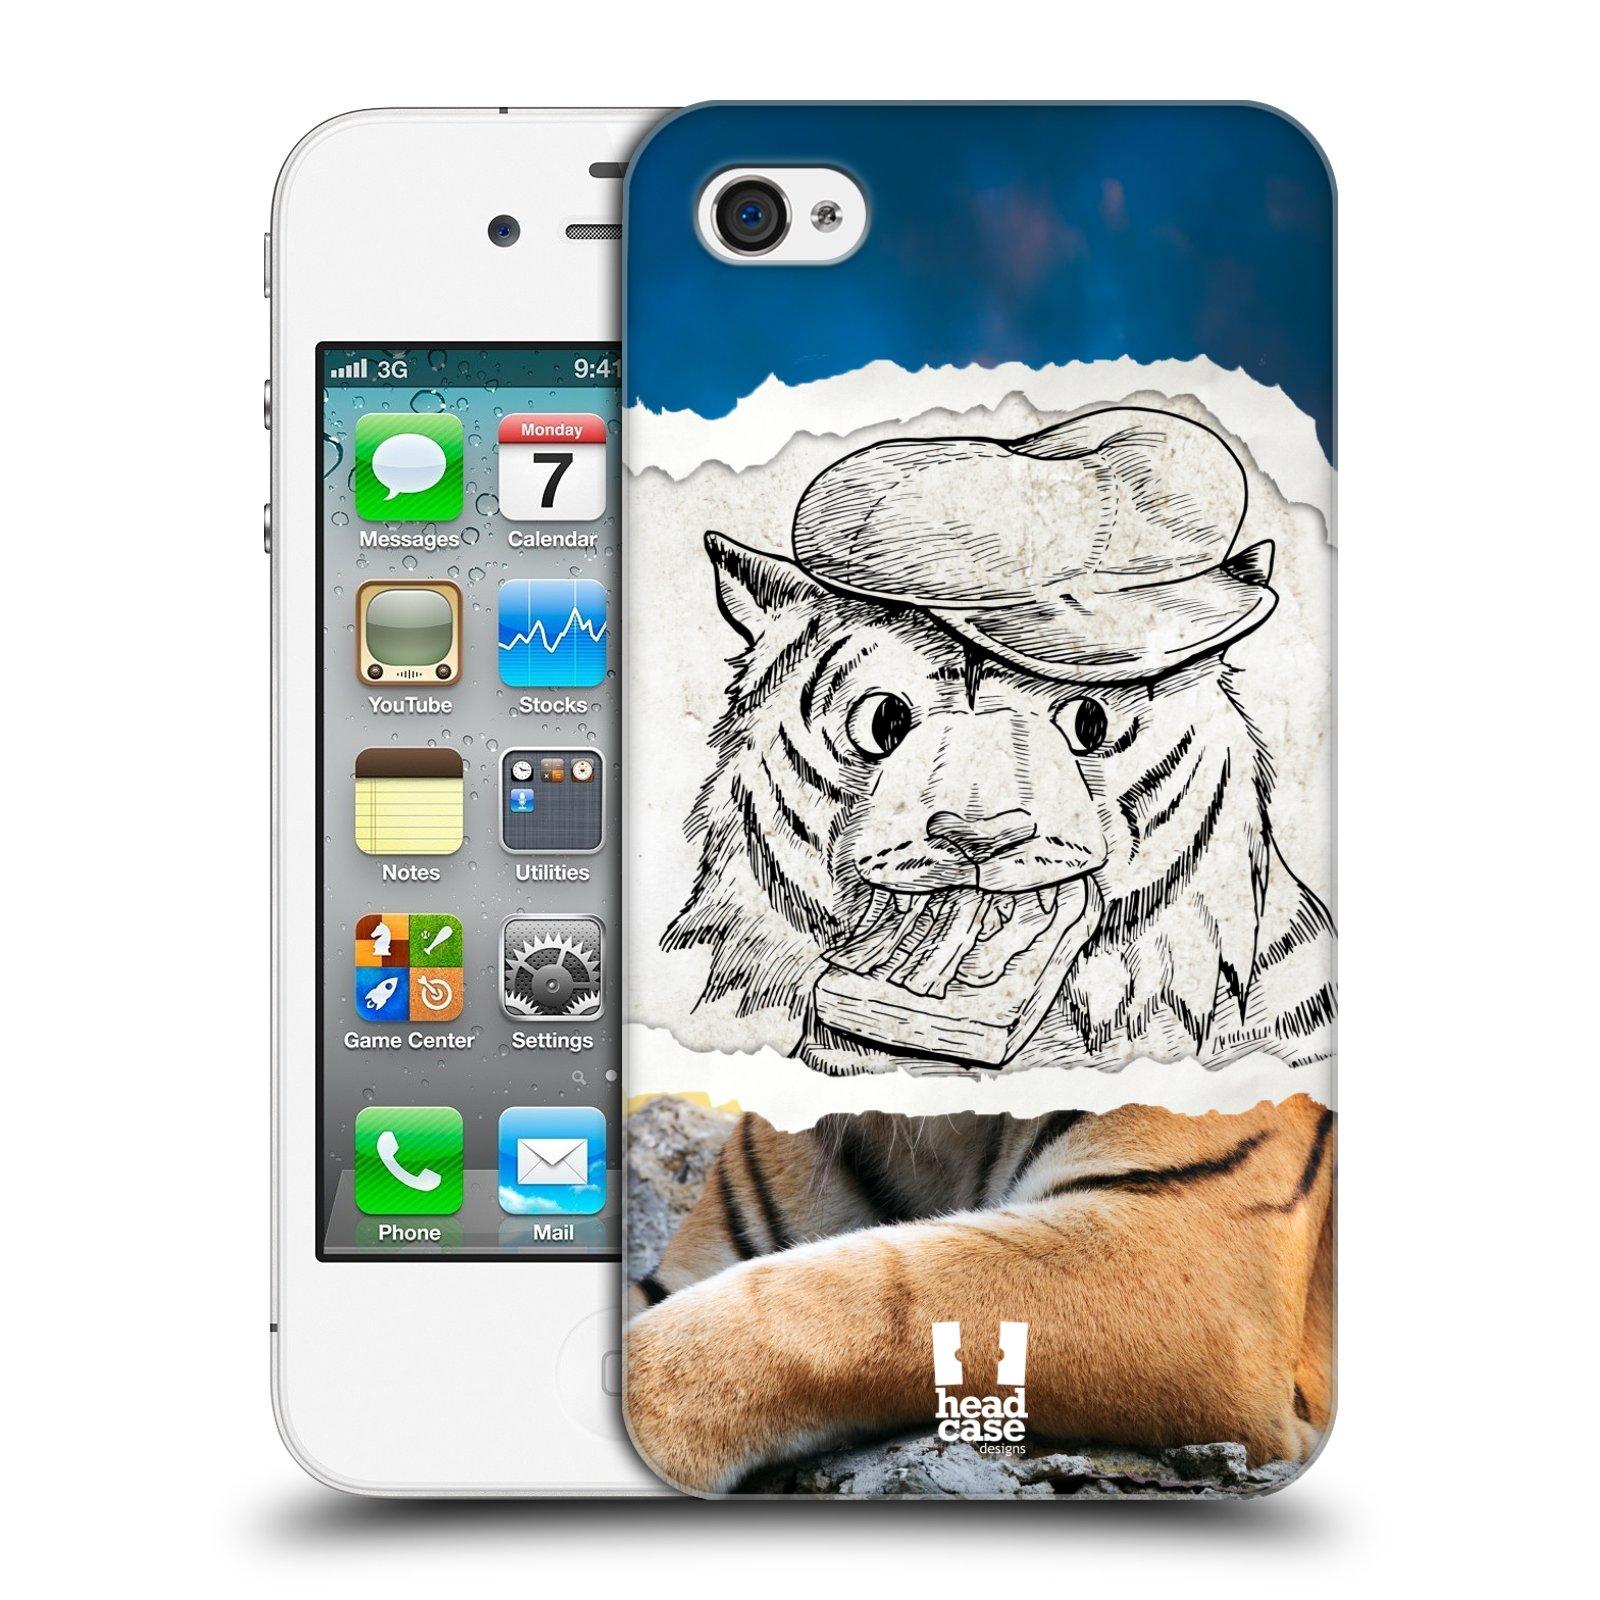 HEAD CASE plastový obal na mobil Apple Iphone 4/4S vzor zvířata koláž tygr fešák